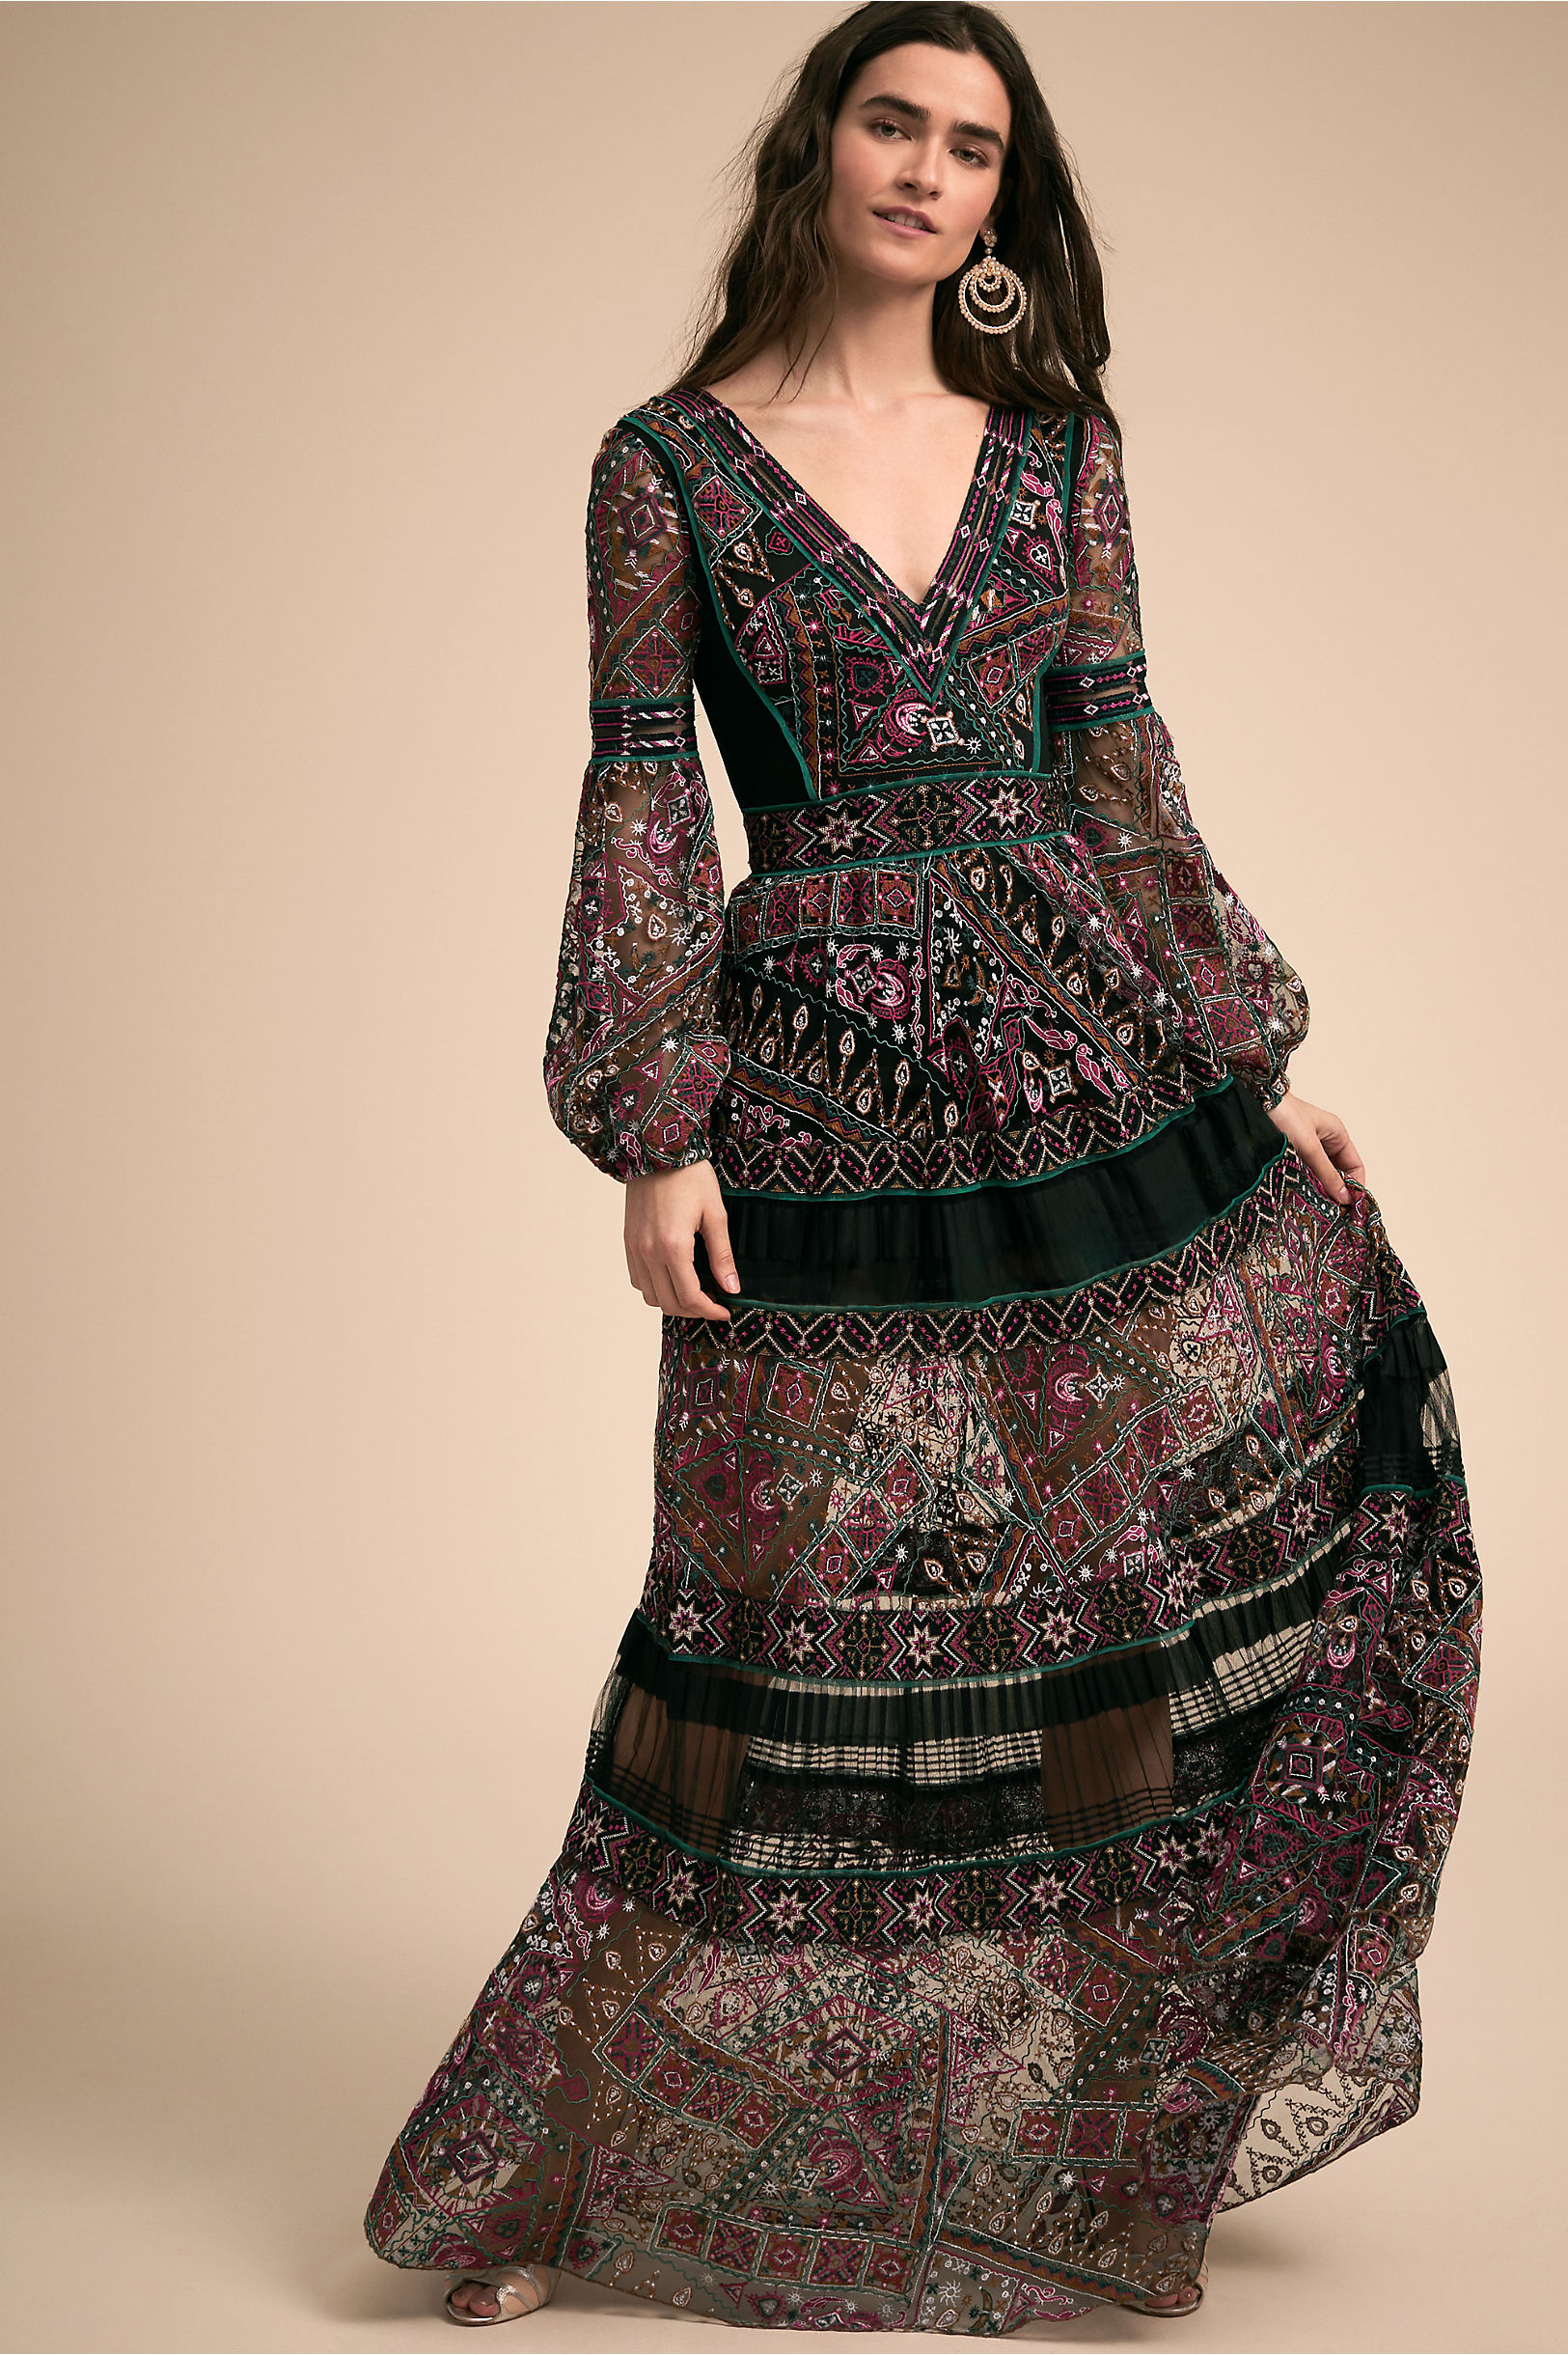 Fidella Dress in Sale | BHLDN